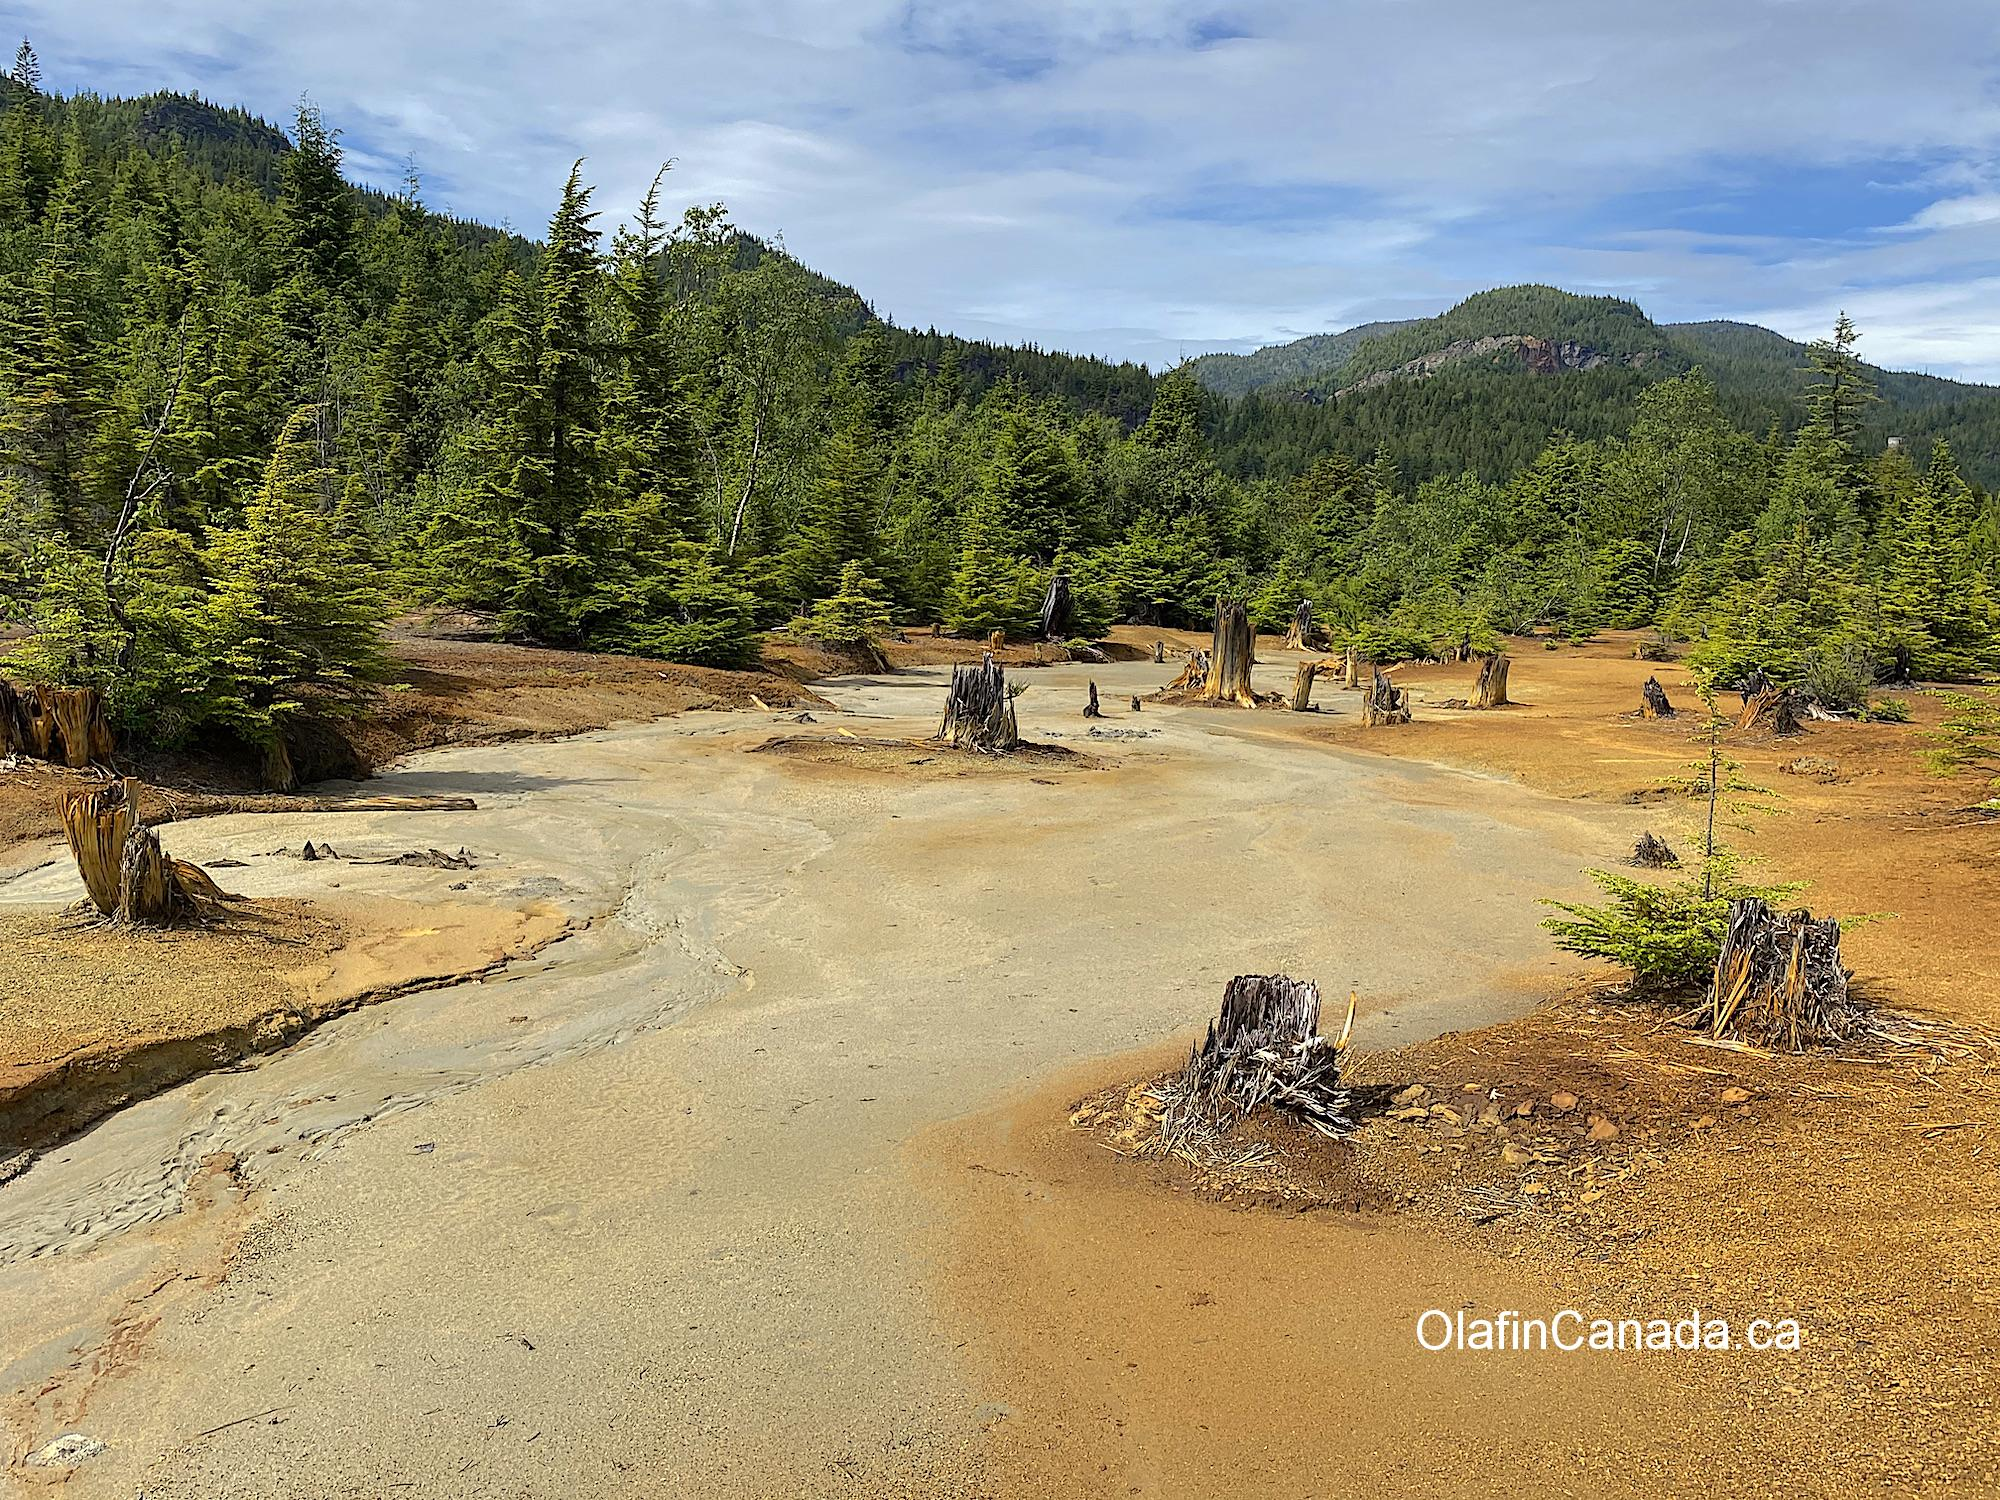 Polluted Hidden Creek in Anyox #olafincanada #britishcolumbia #discoverbc #abandonedbc #anyox